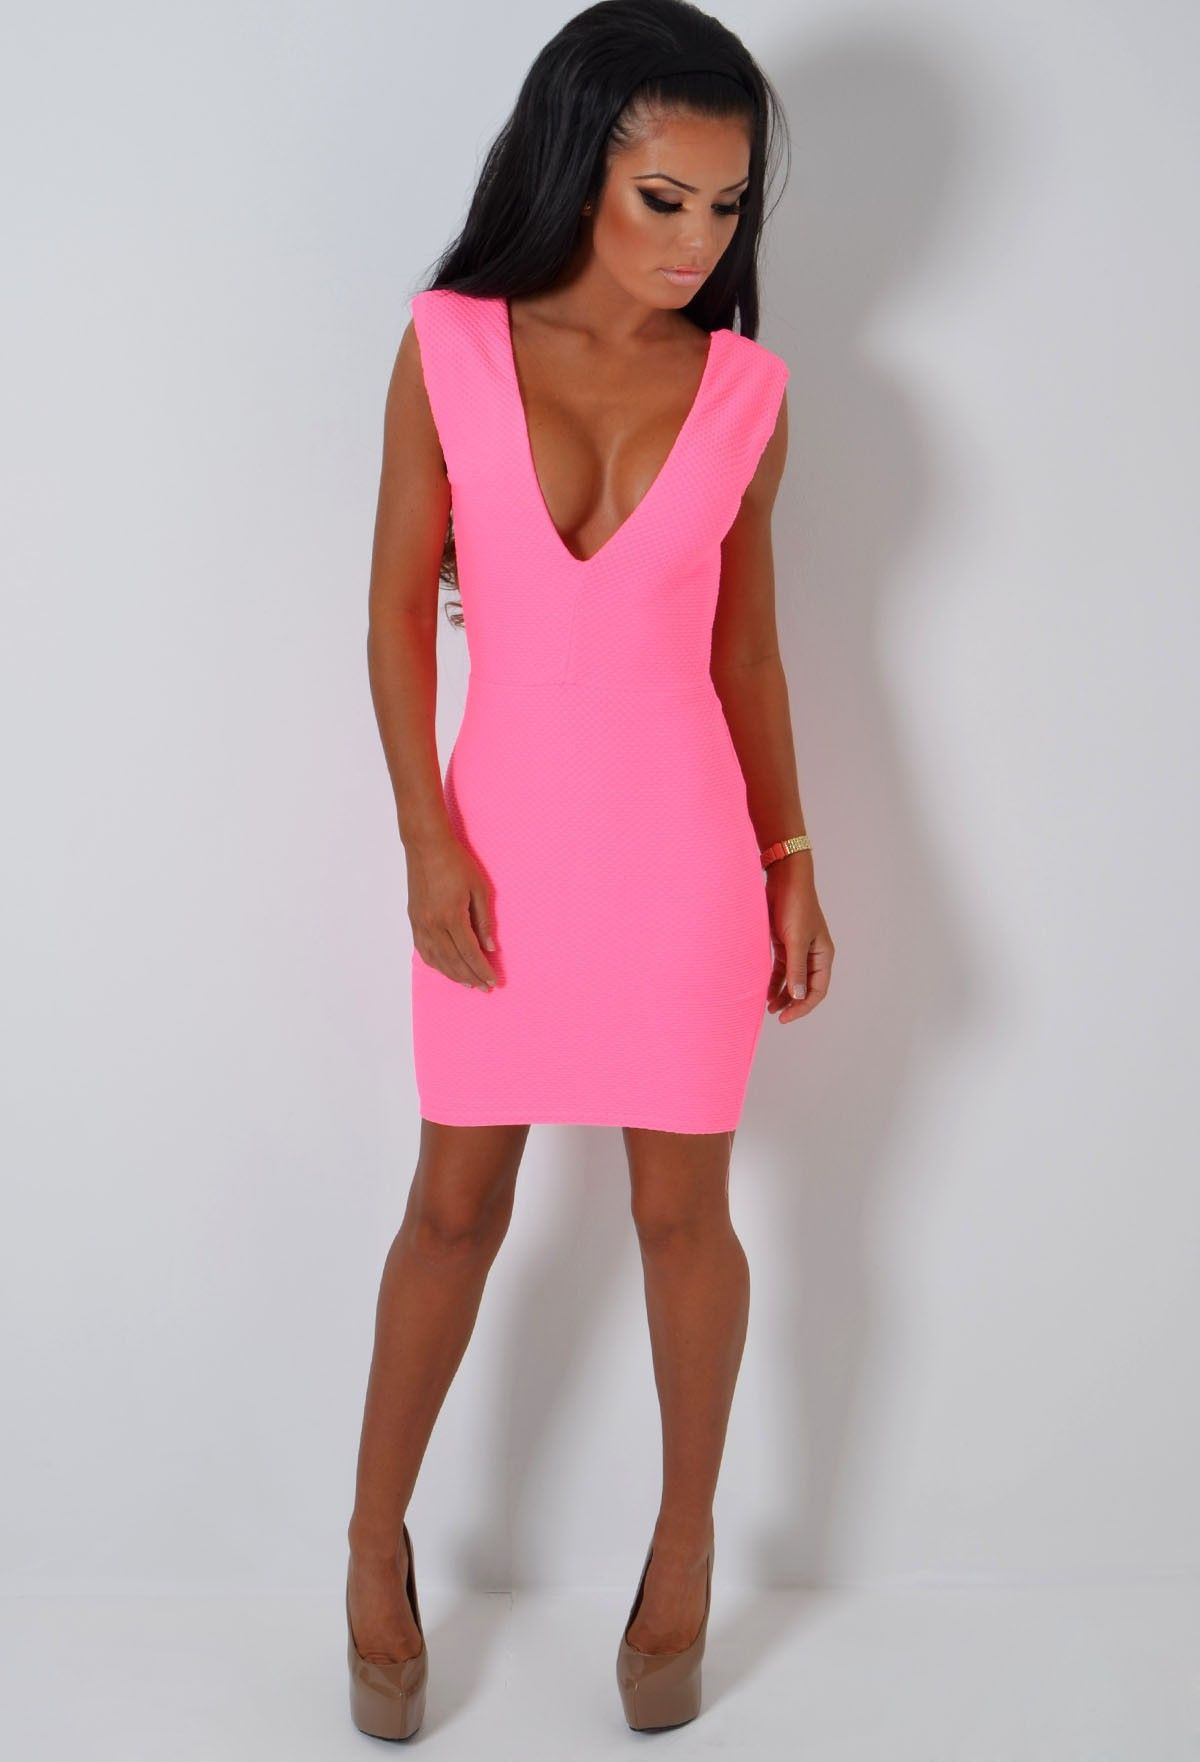 e95ac3c8cf Crushin Neon Pink Textured Super Stretch Deep Plunge Bodycon Mini Dress